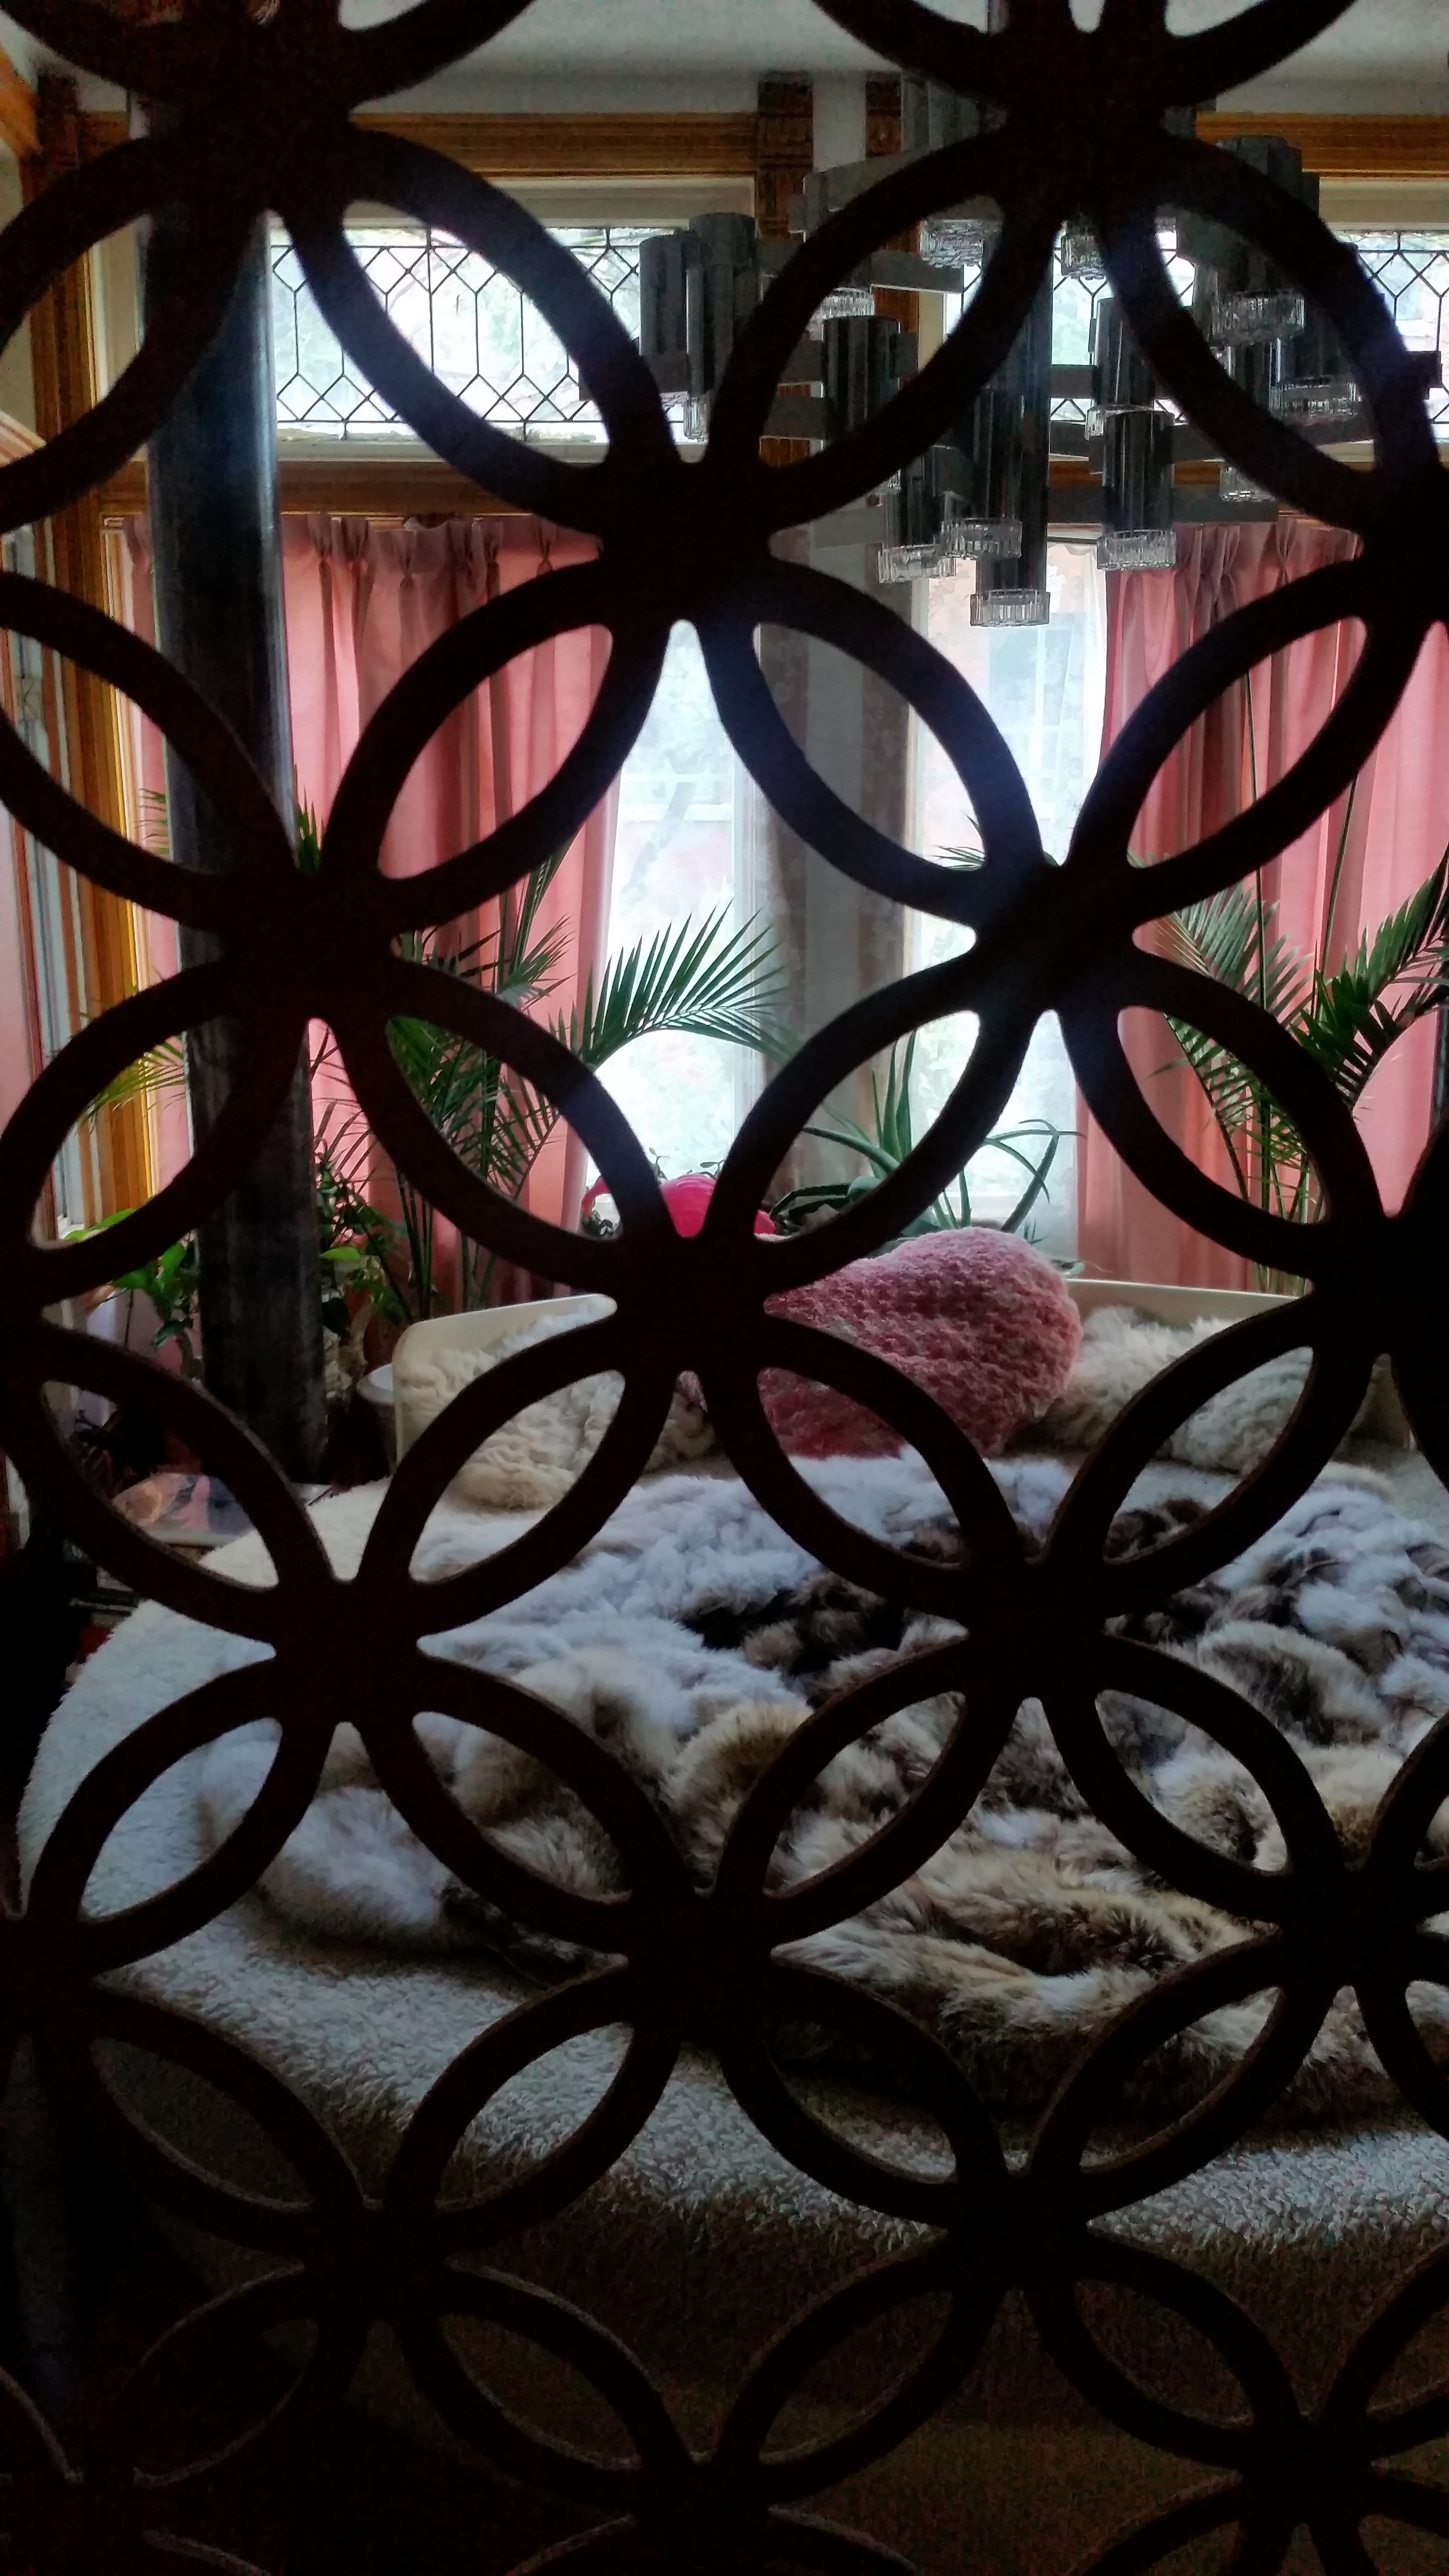 Looking through the lattice into the main floor bedroom.